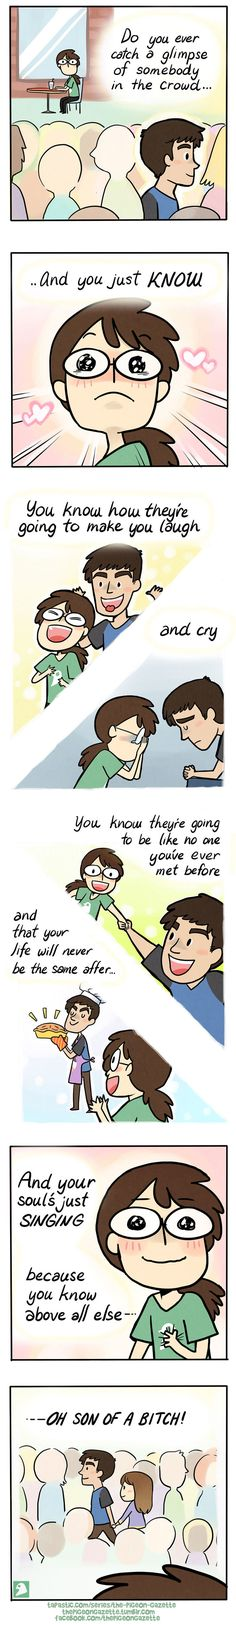 pardon the language 10+ Hilarious Comics For Socially Awkward People